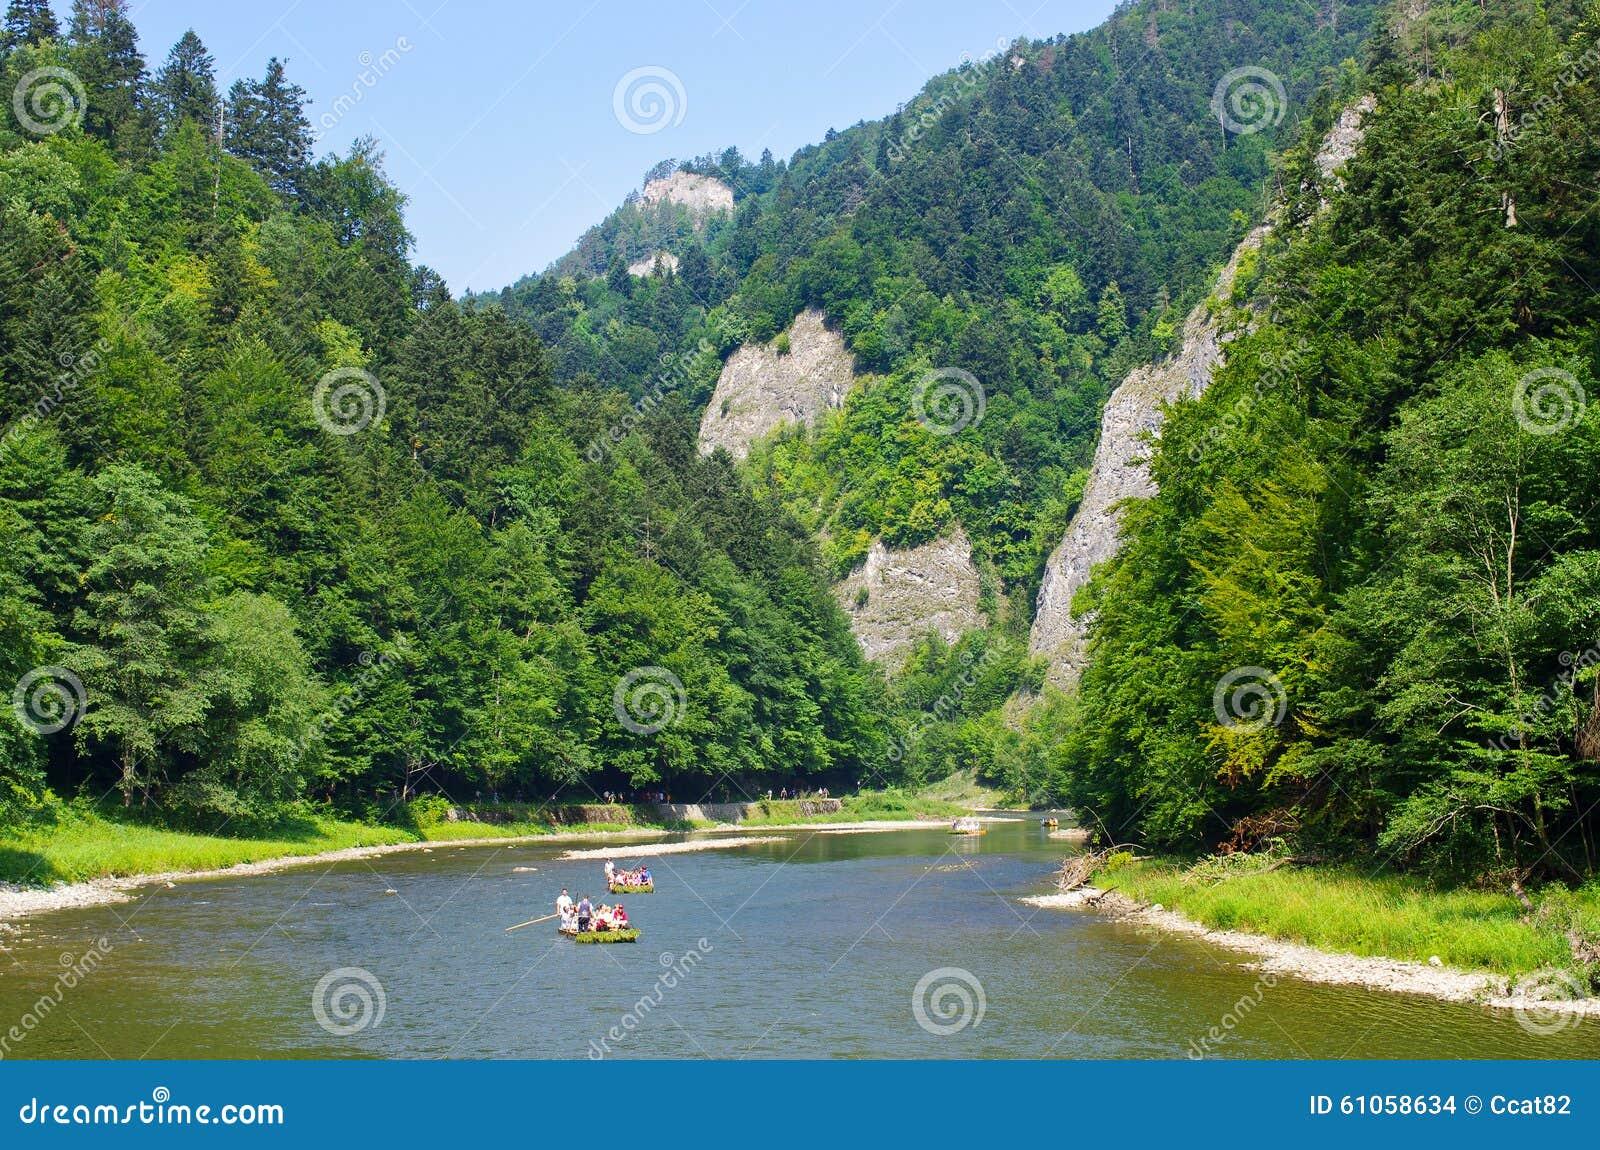 Dunajec river in Pieniny mountains, Poland